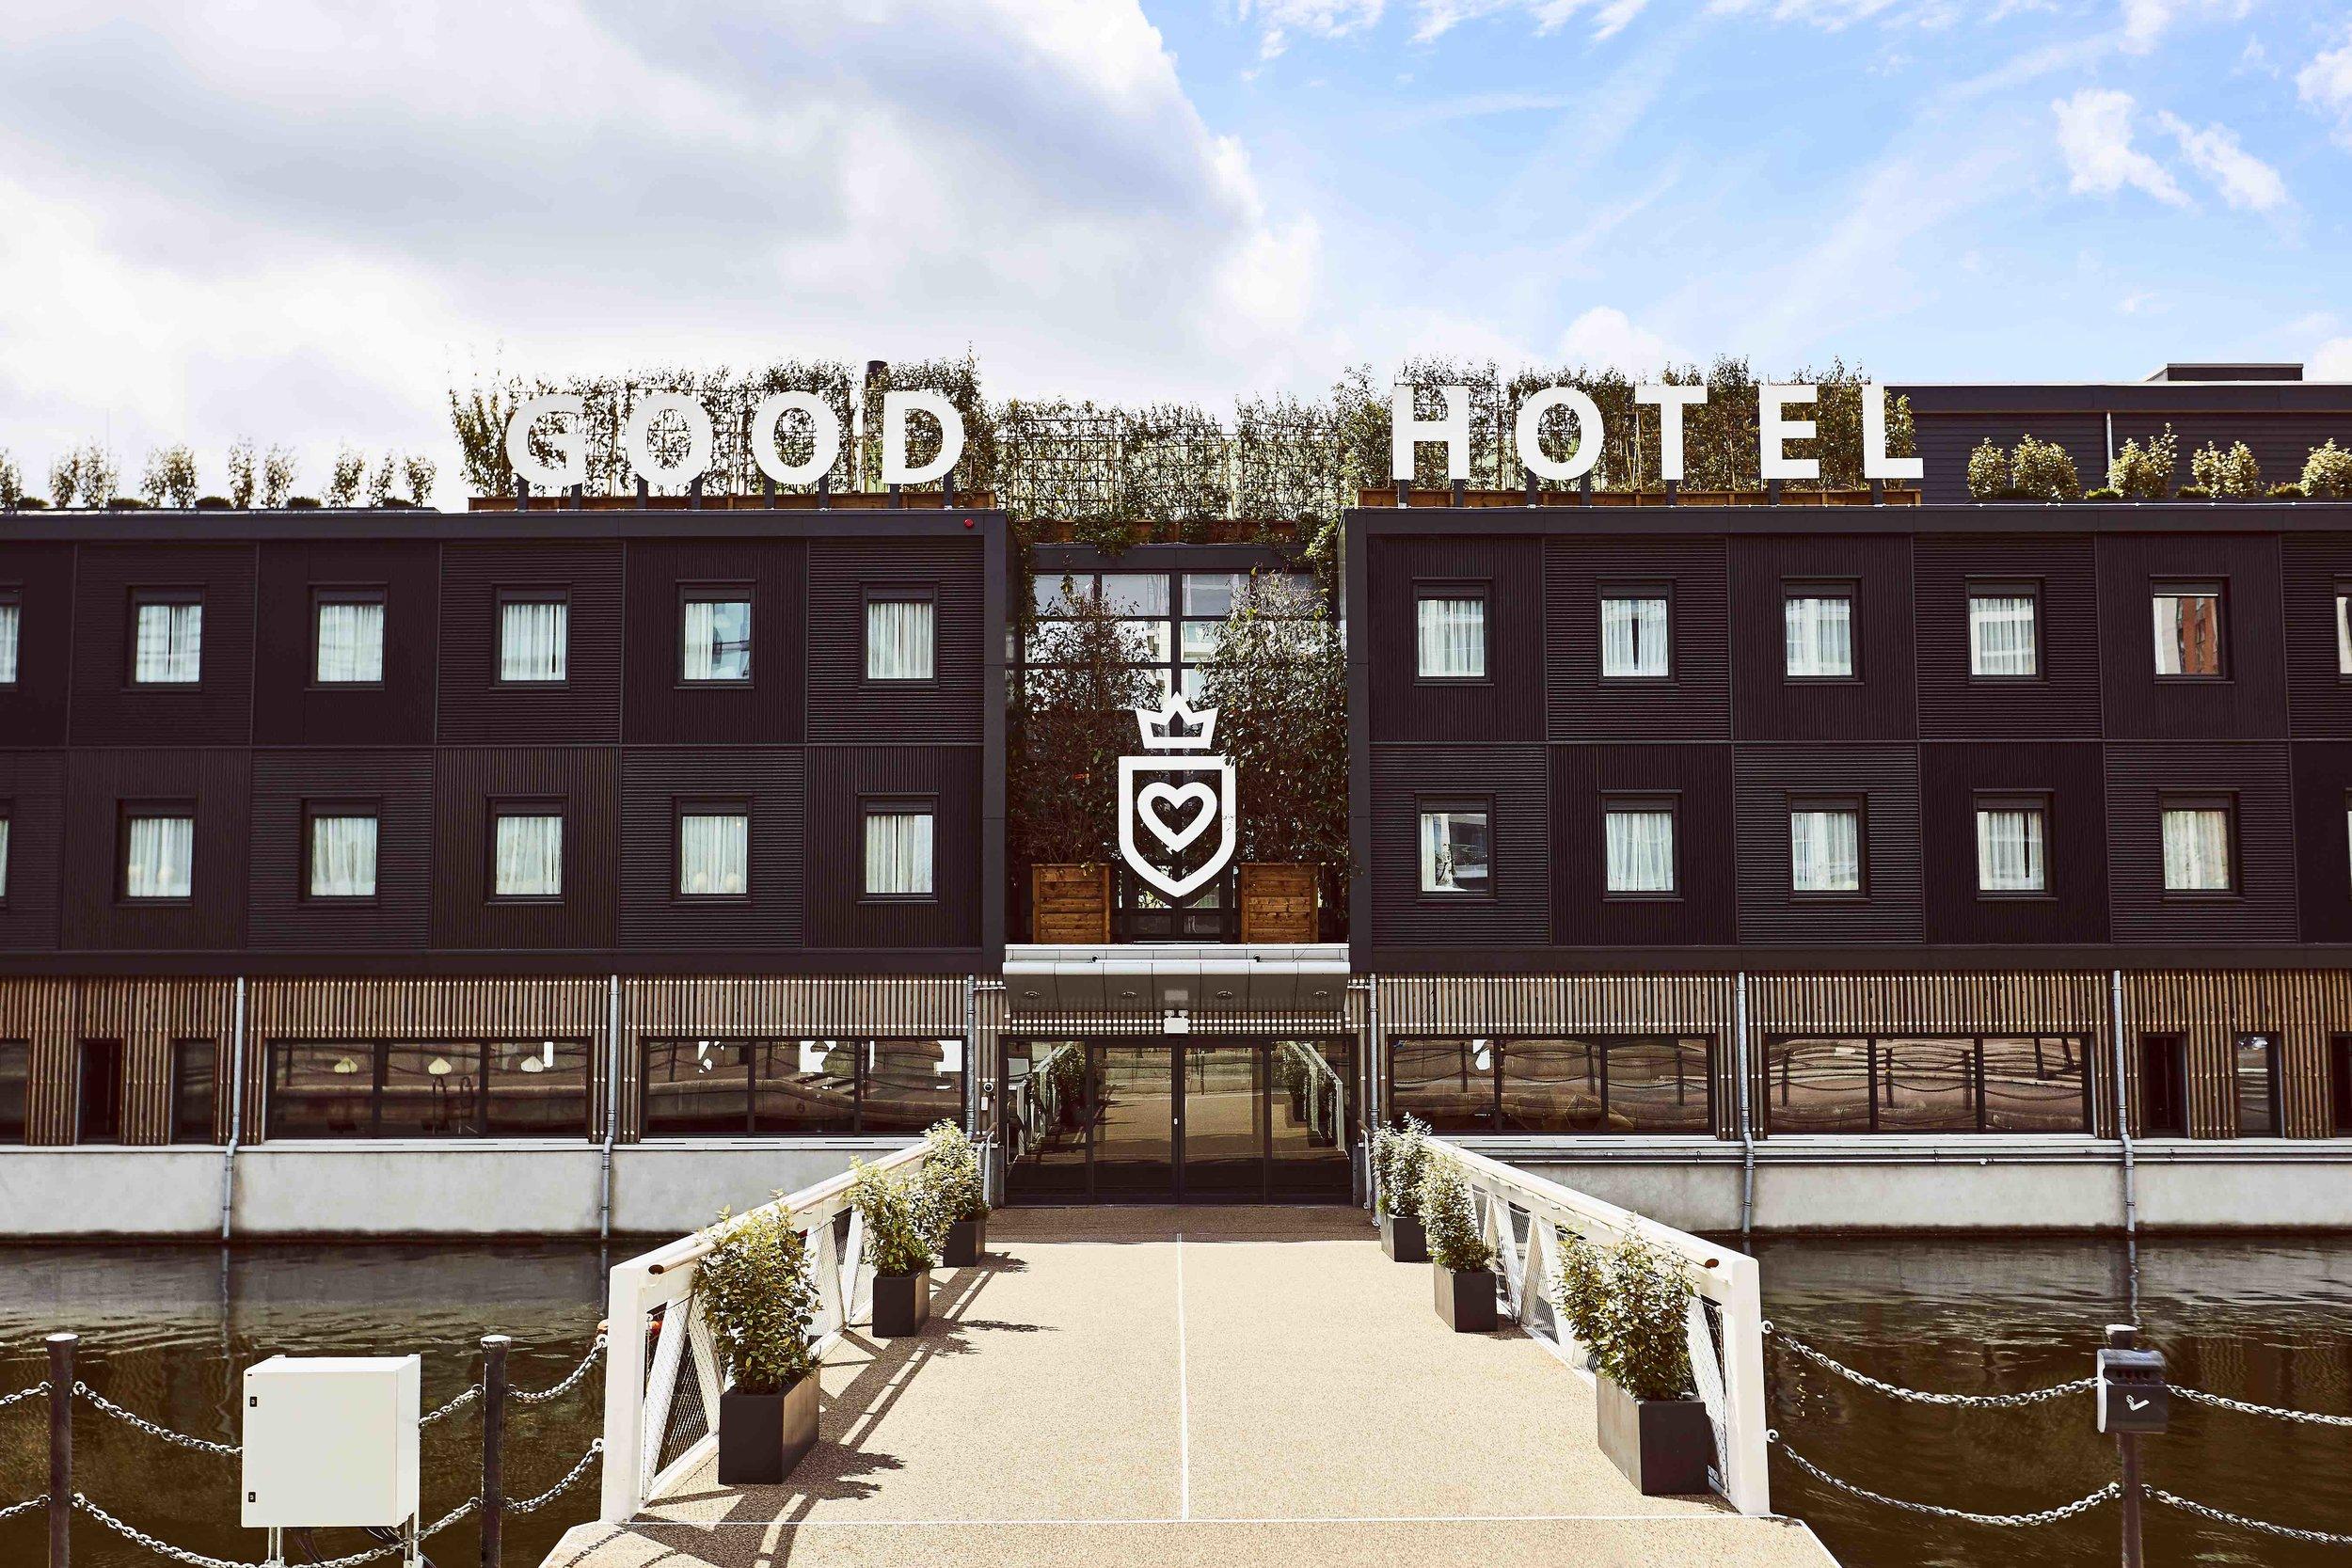 Exterior Good Hotel London